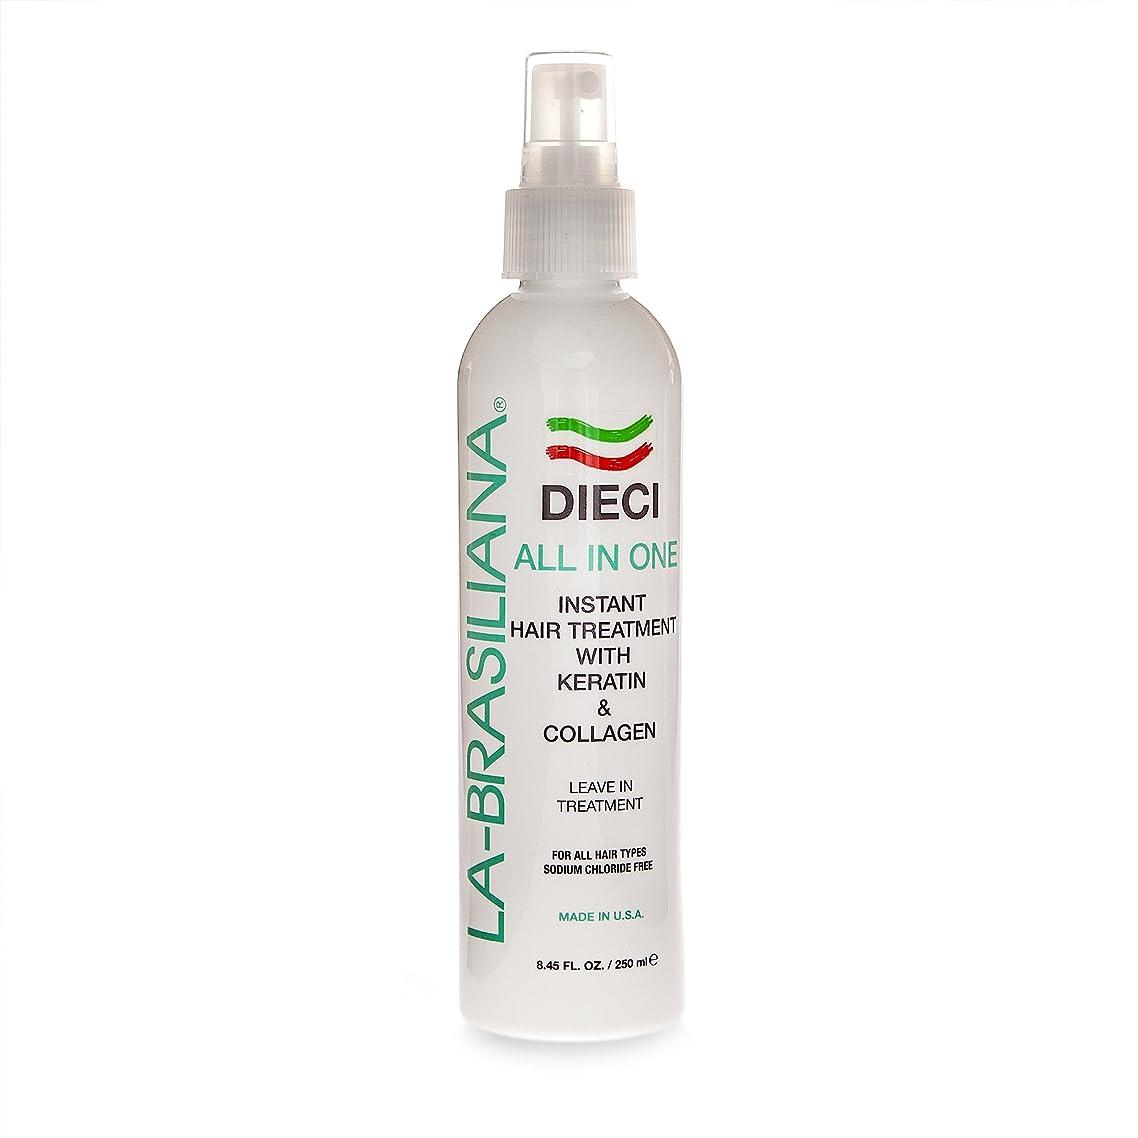 La-Brasiliana Dieci All-In-One Instant Hair Treatment, 8.45 fl.oz.